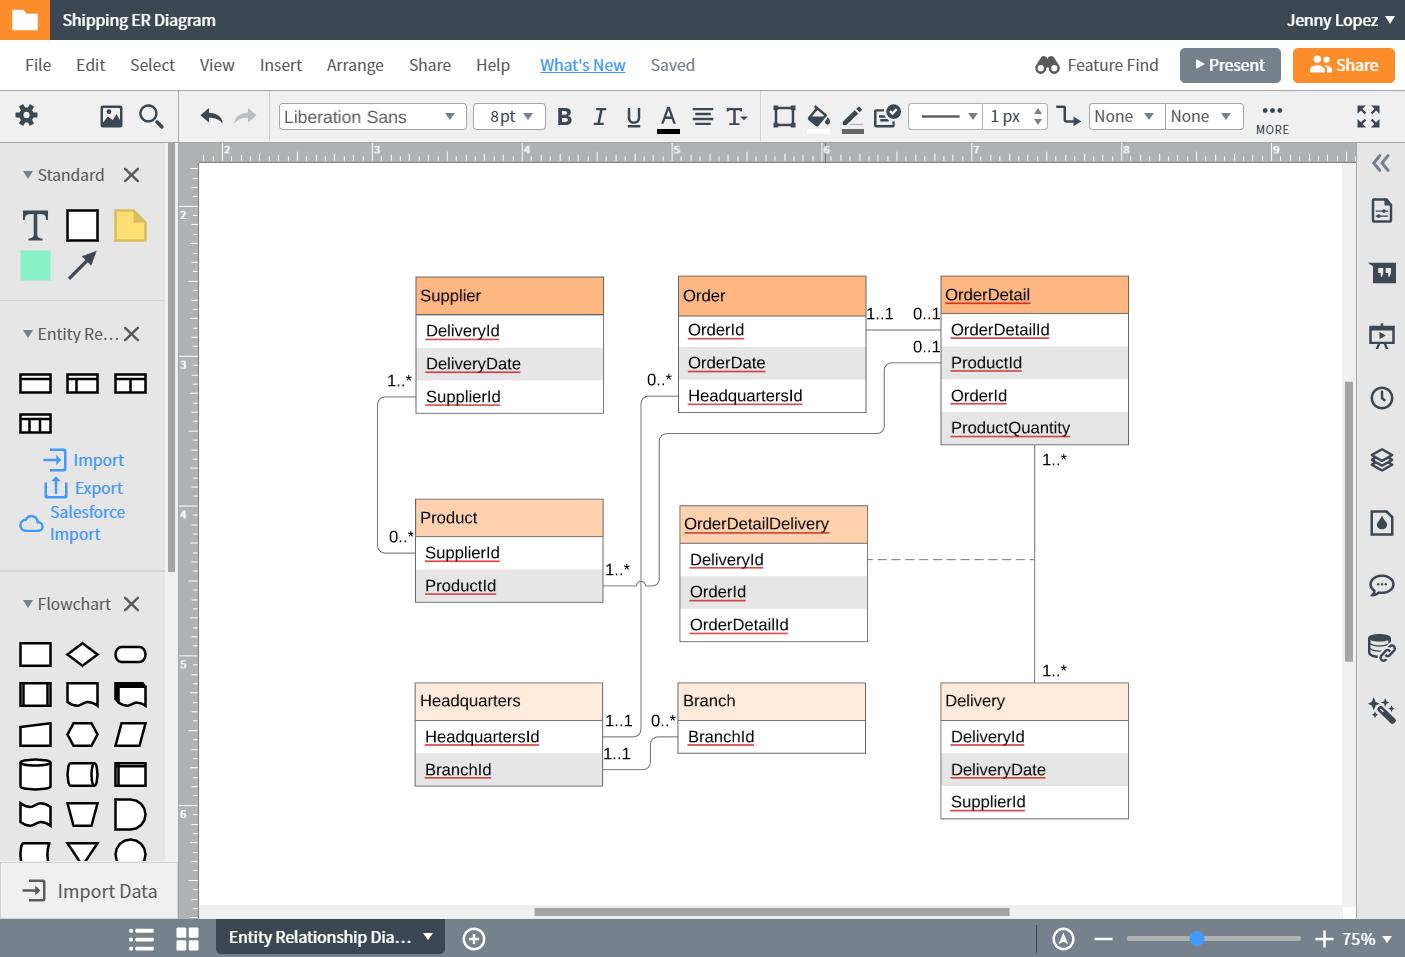 Er Diagram (Erd) Tool | Lucidchart in Online Erd Modeling Tool